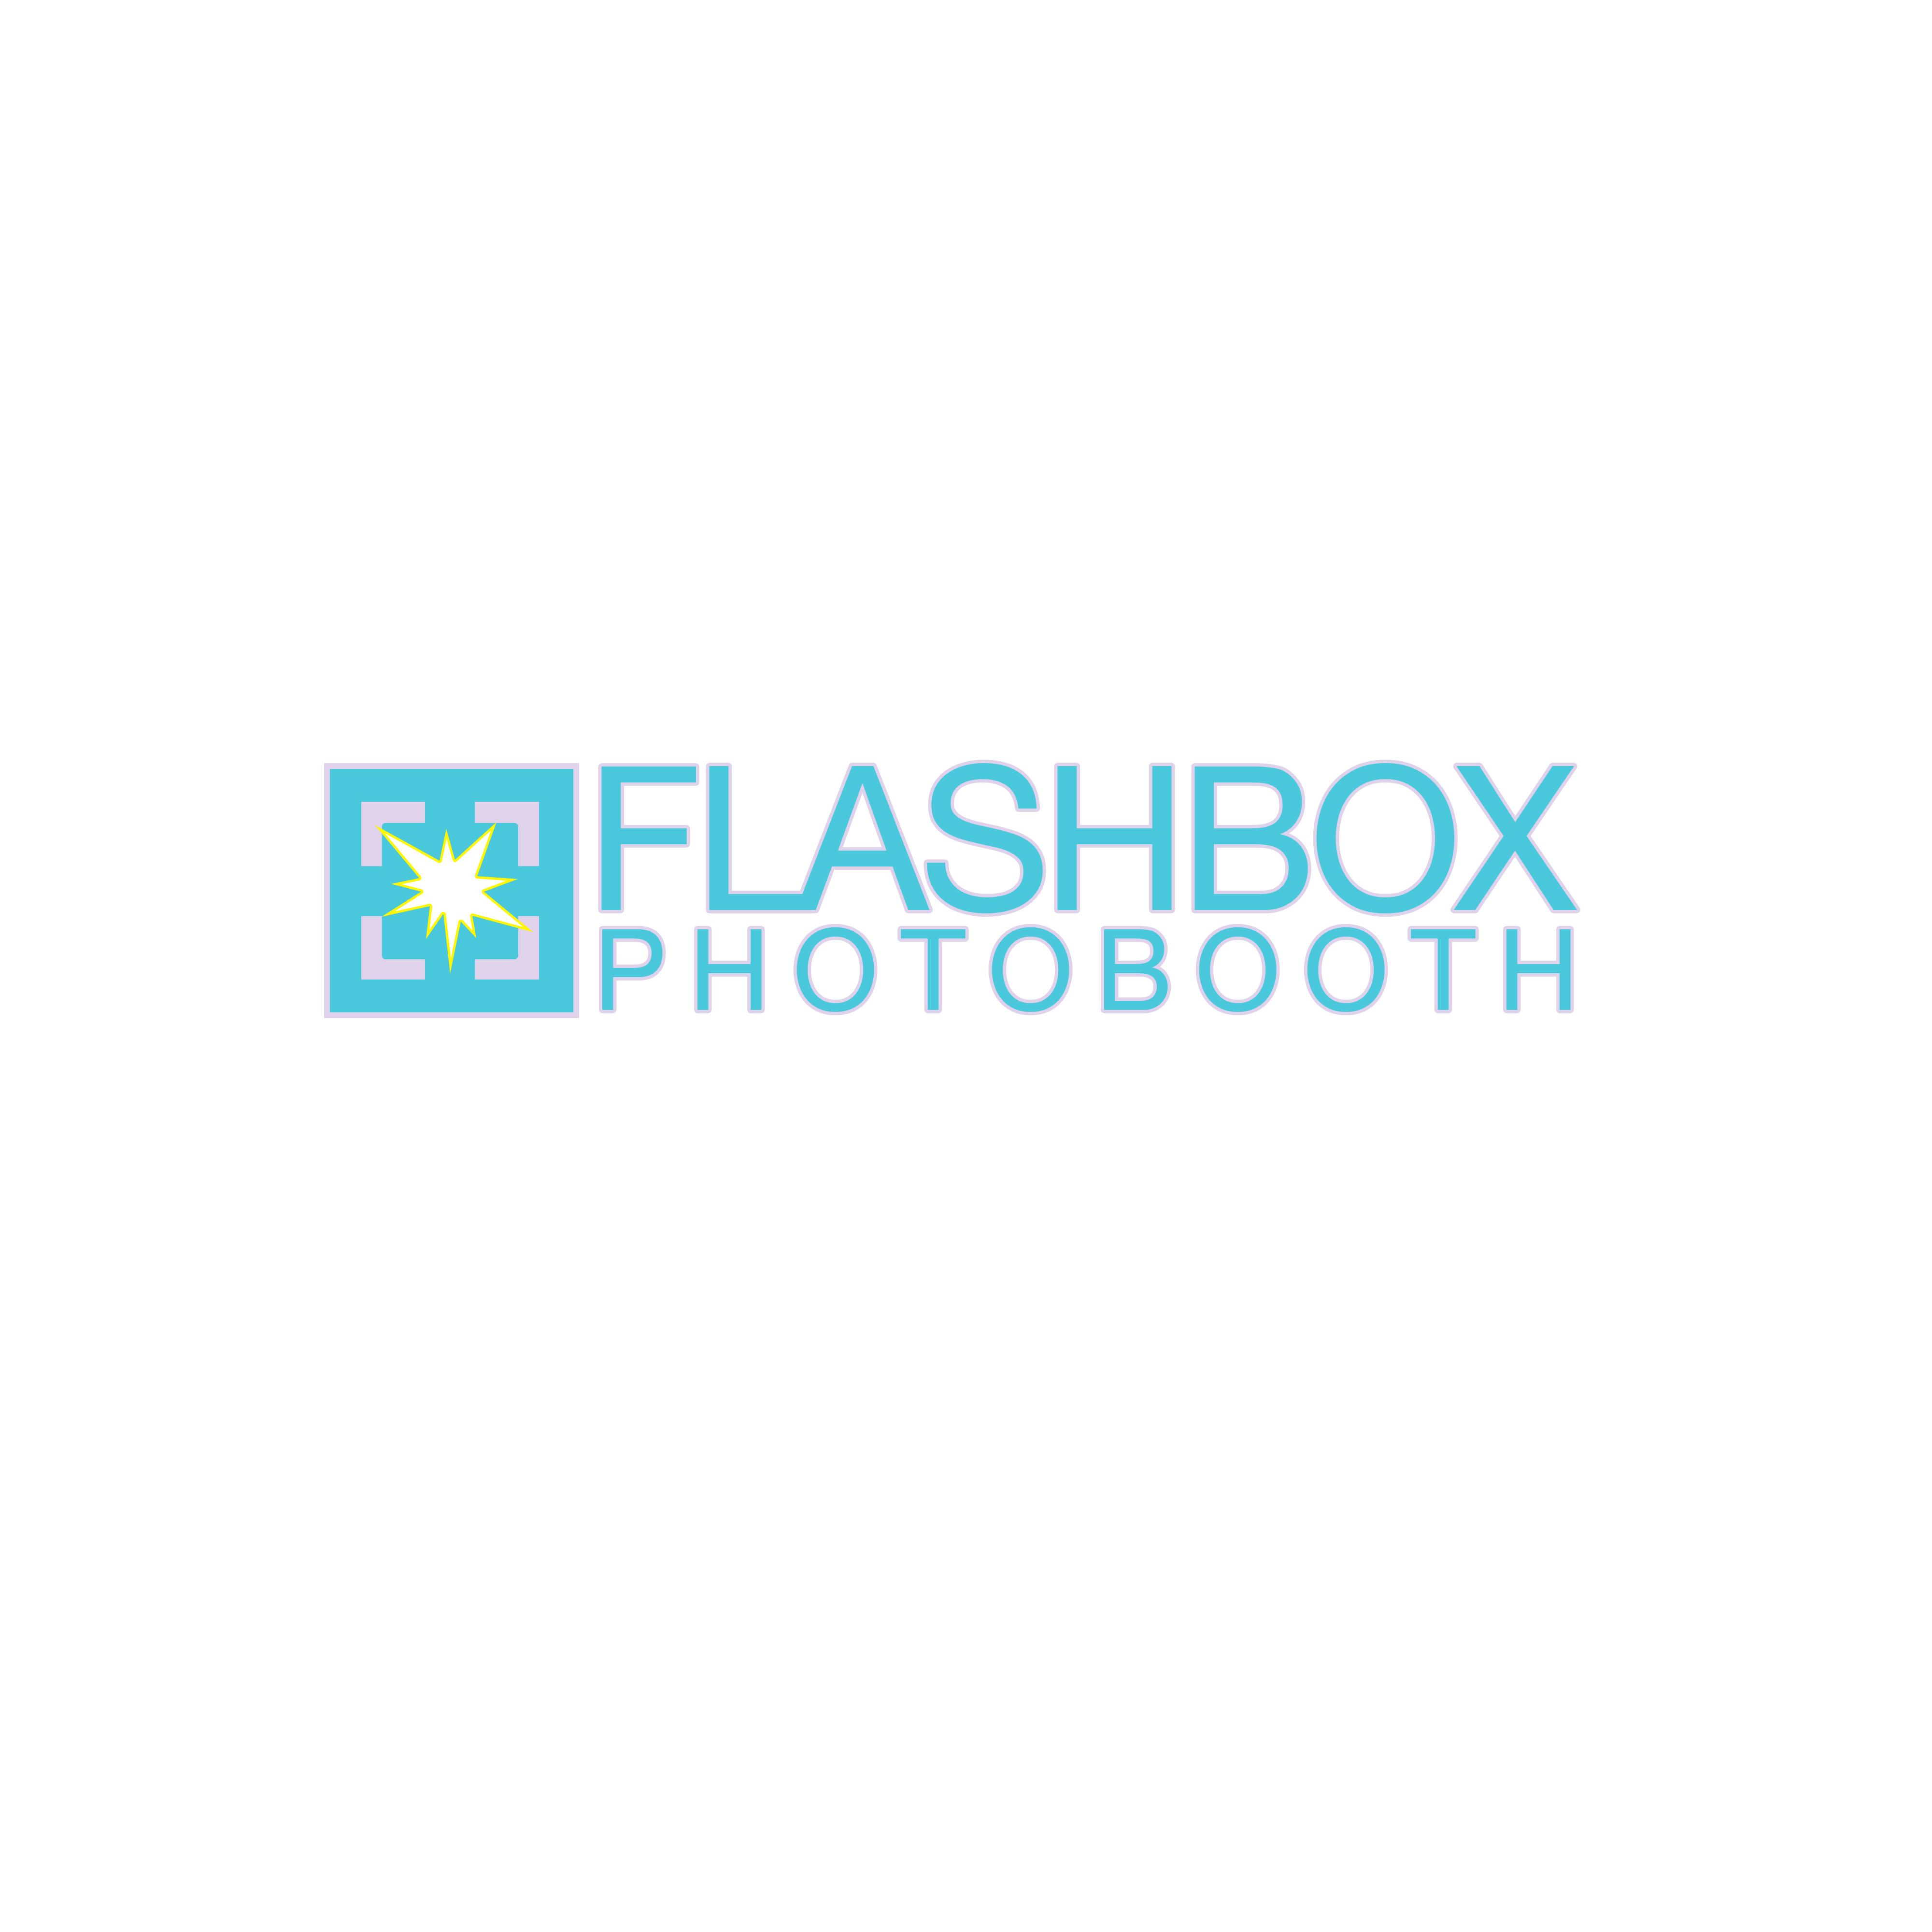 Logo Design by Utkarsh Bhandari - Entry No. 26 in the Logo Design Contest New Logo Design for FlashBox Photobooths.